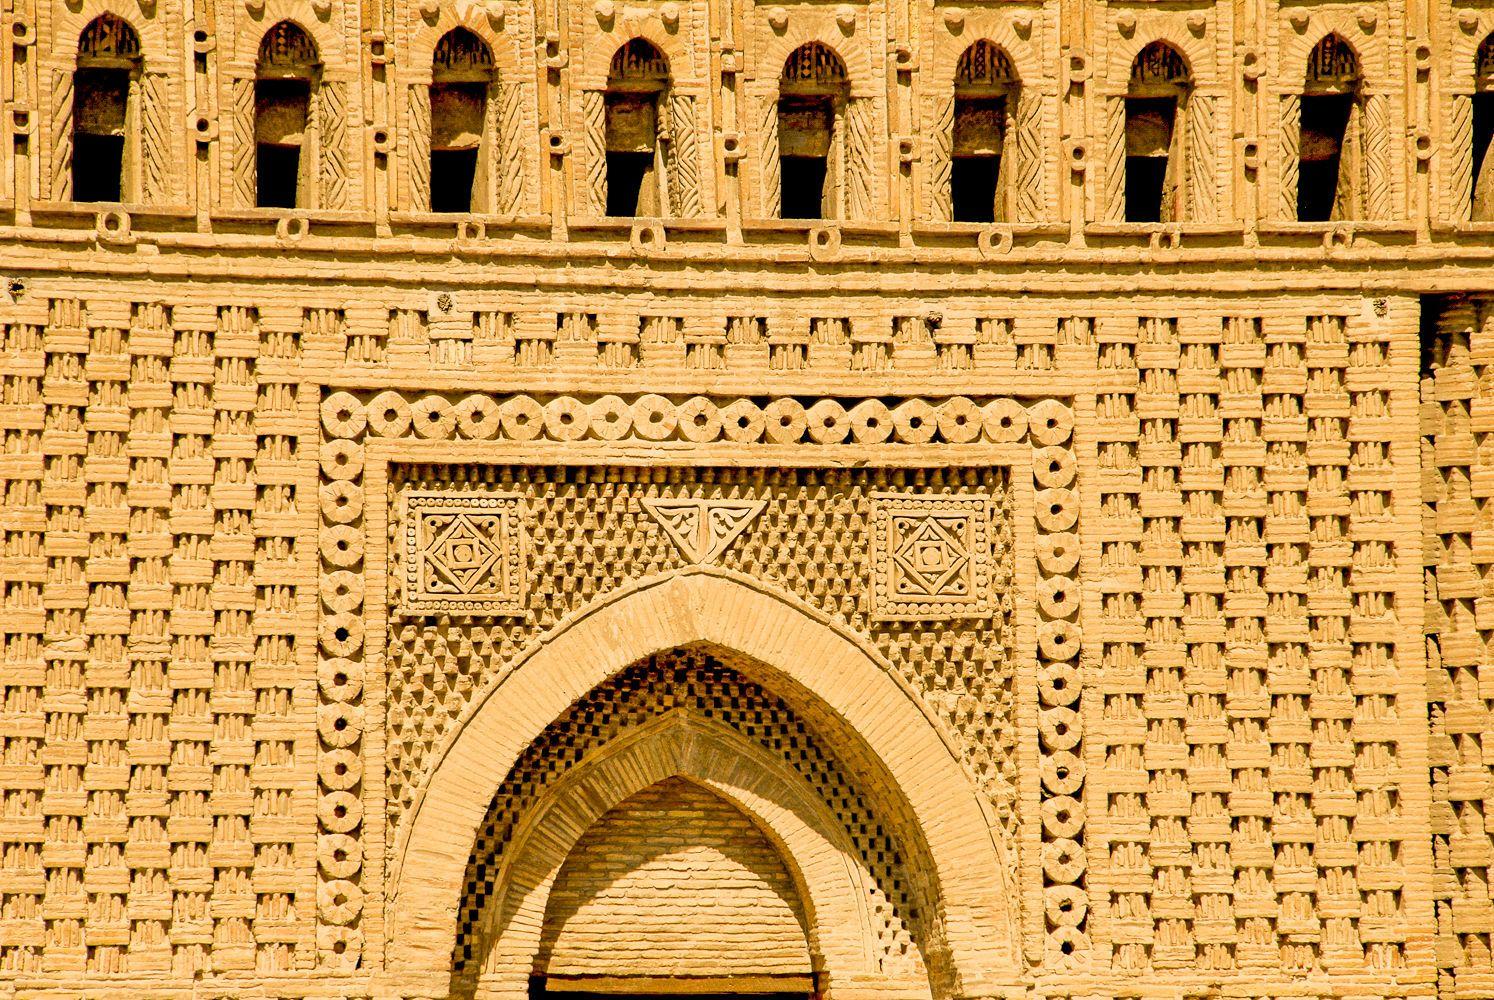 detailed brickwork on samanid mausoleum in Bukhara, Uzbekistan travel